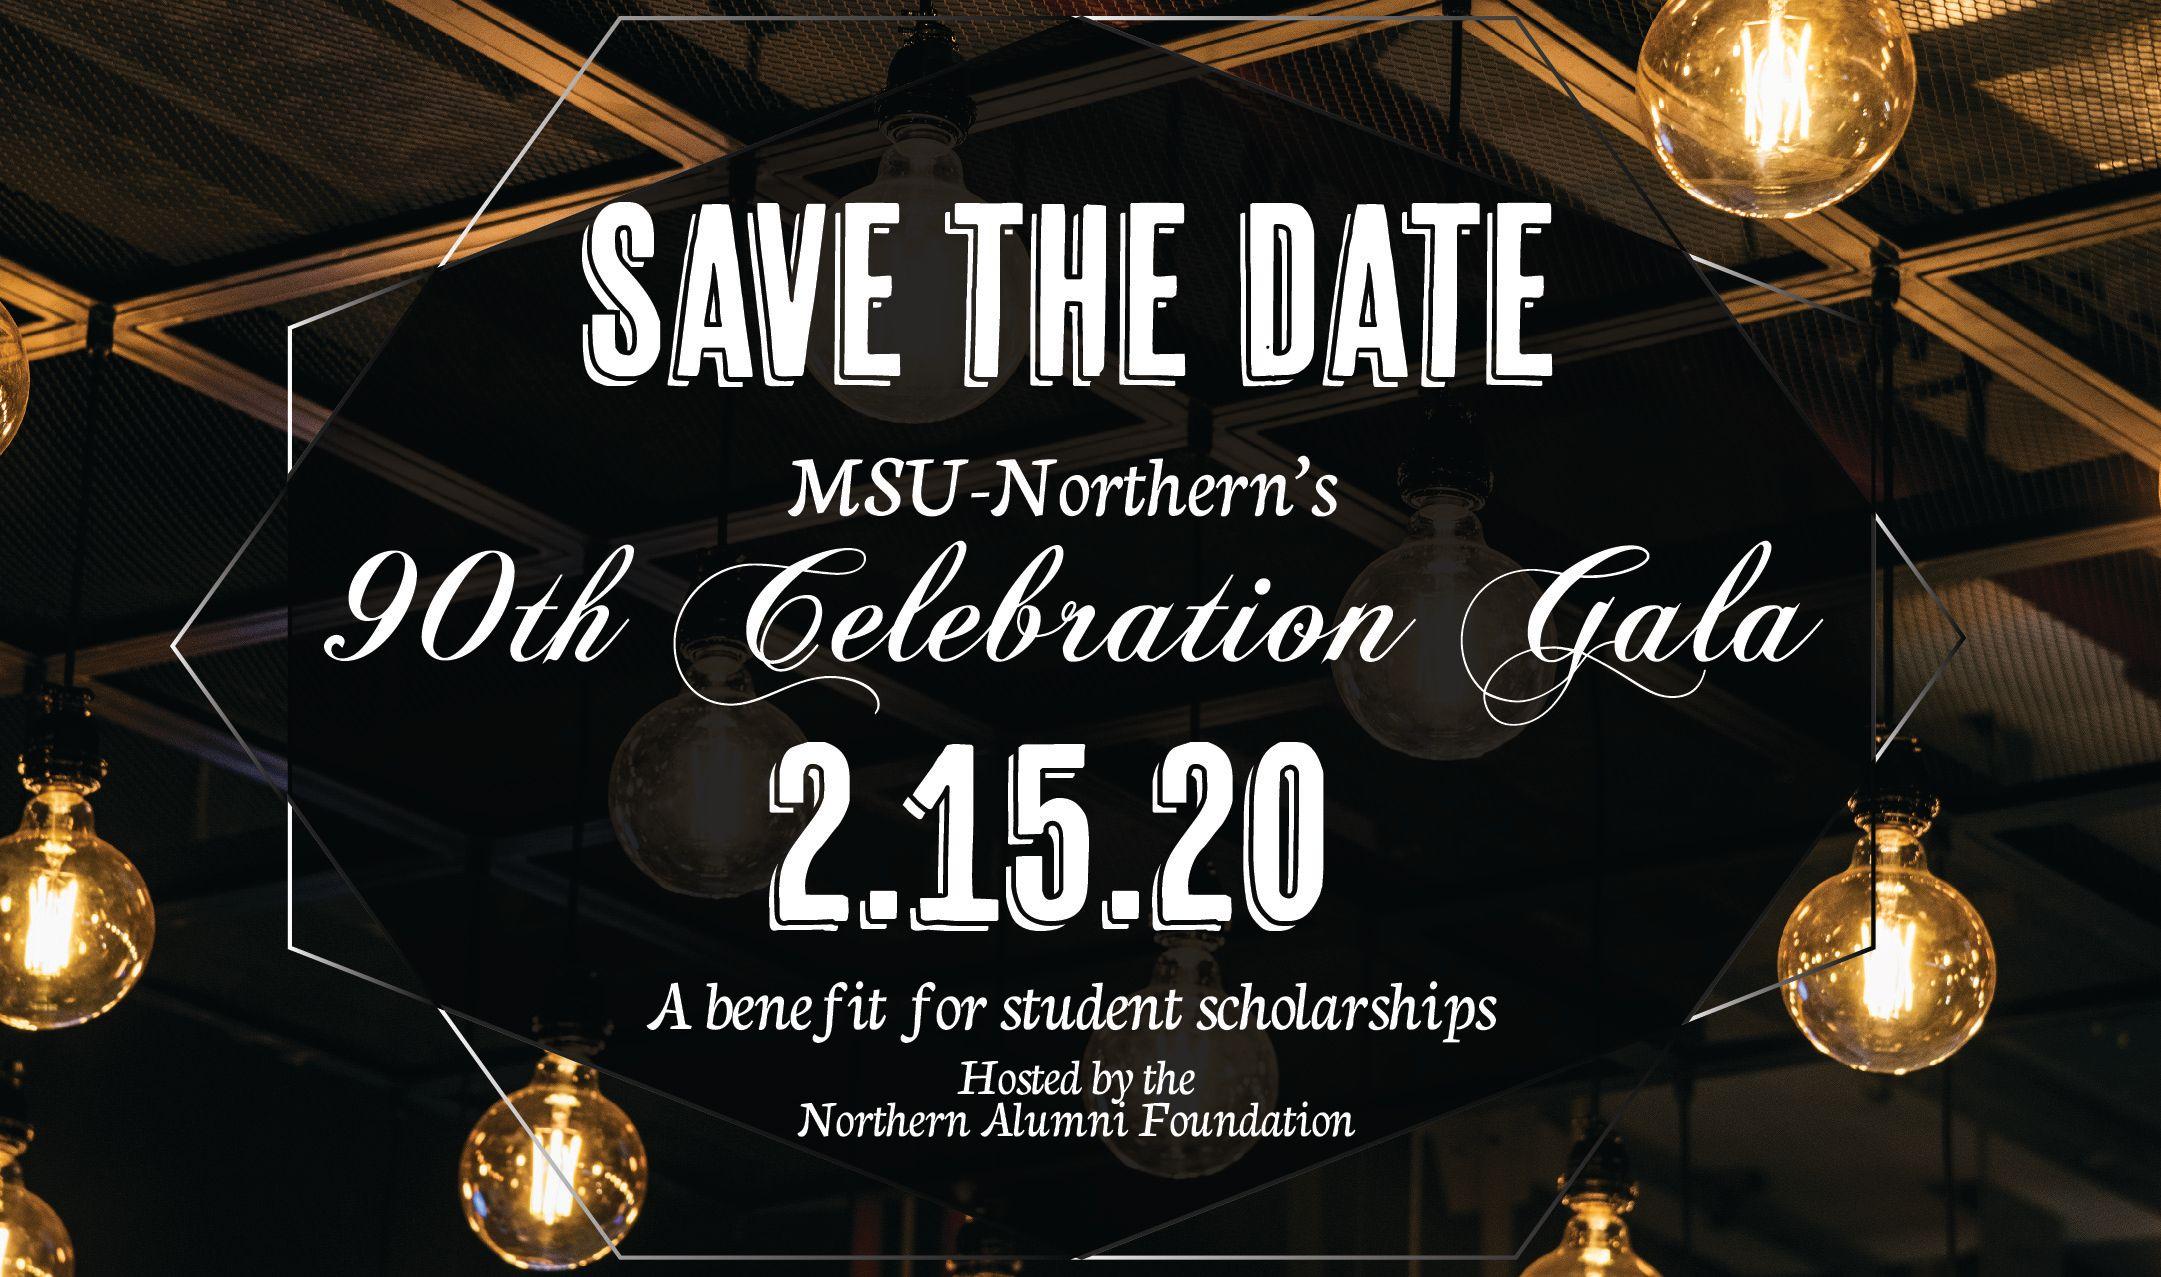 90th Celebration Gala